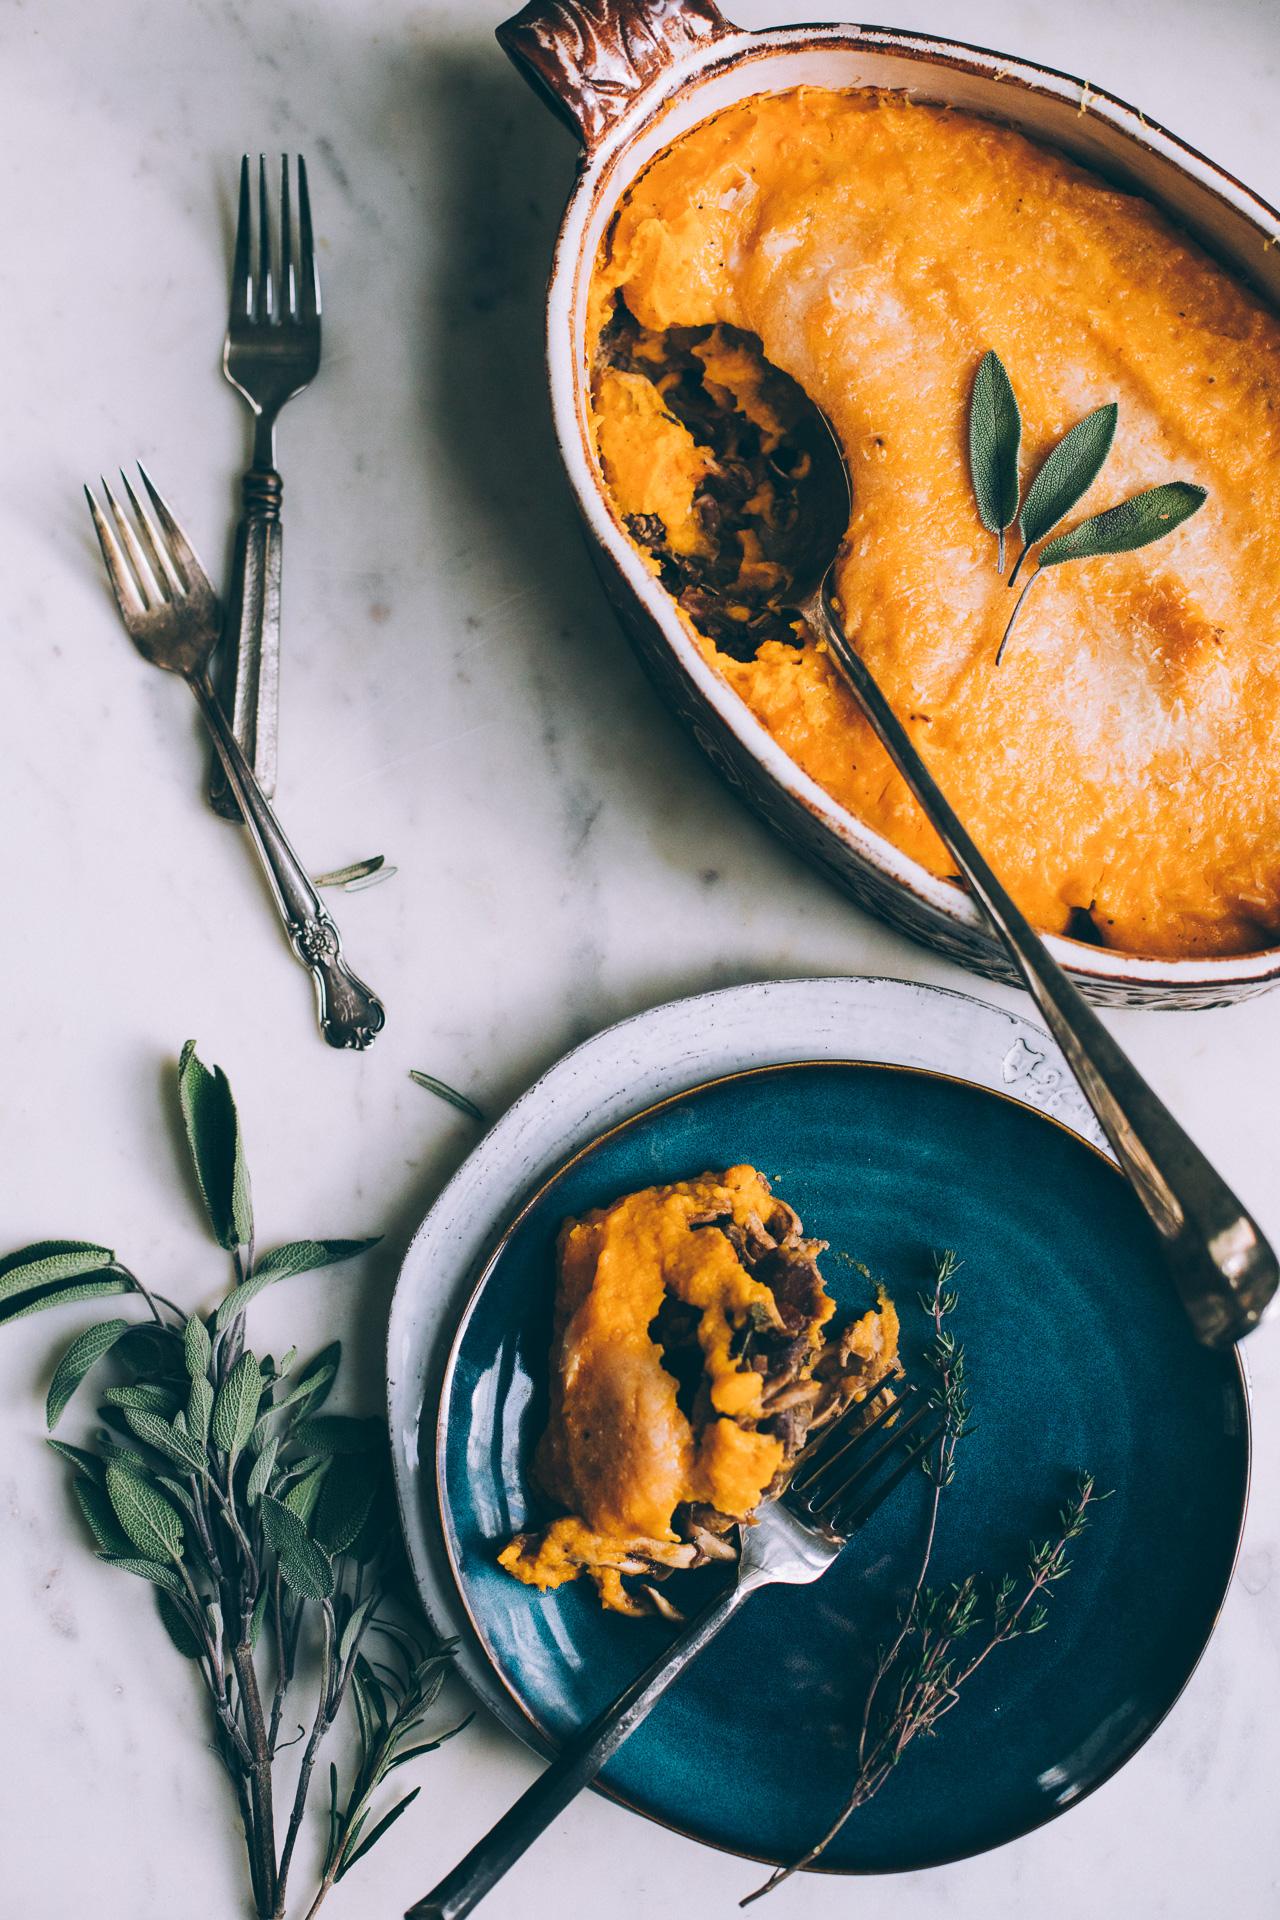 vegan butternut squash shepherds pie with lentils and mushrooms | recipe via willfrolicforfood.com